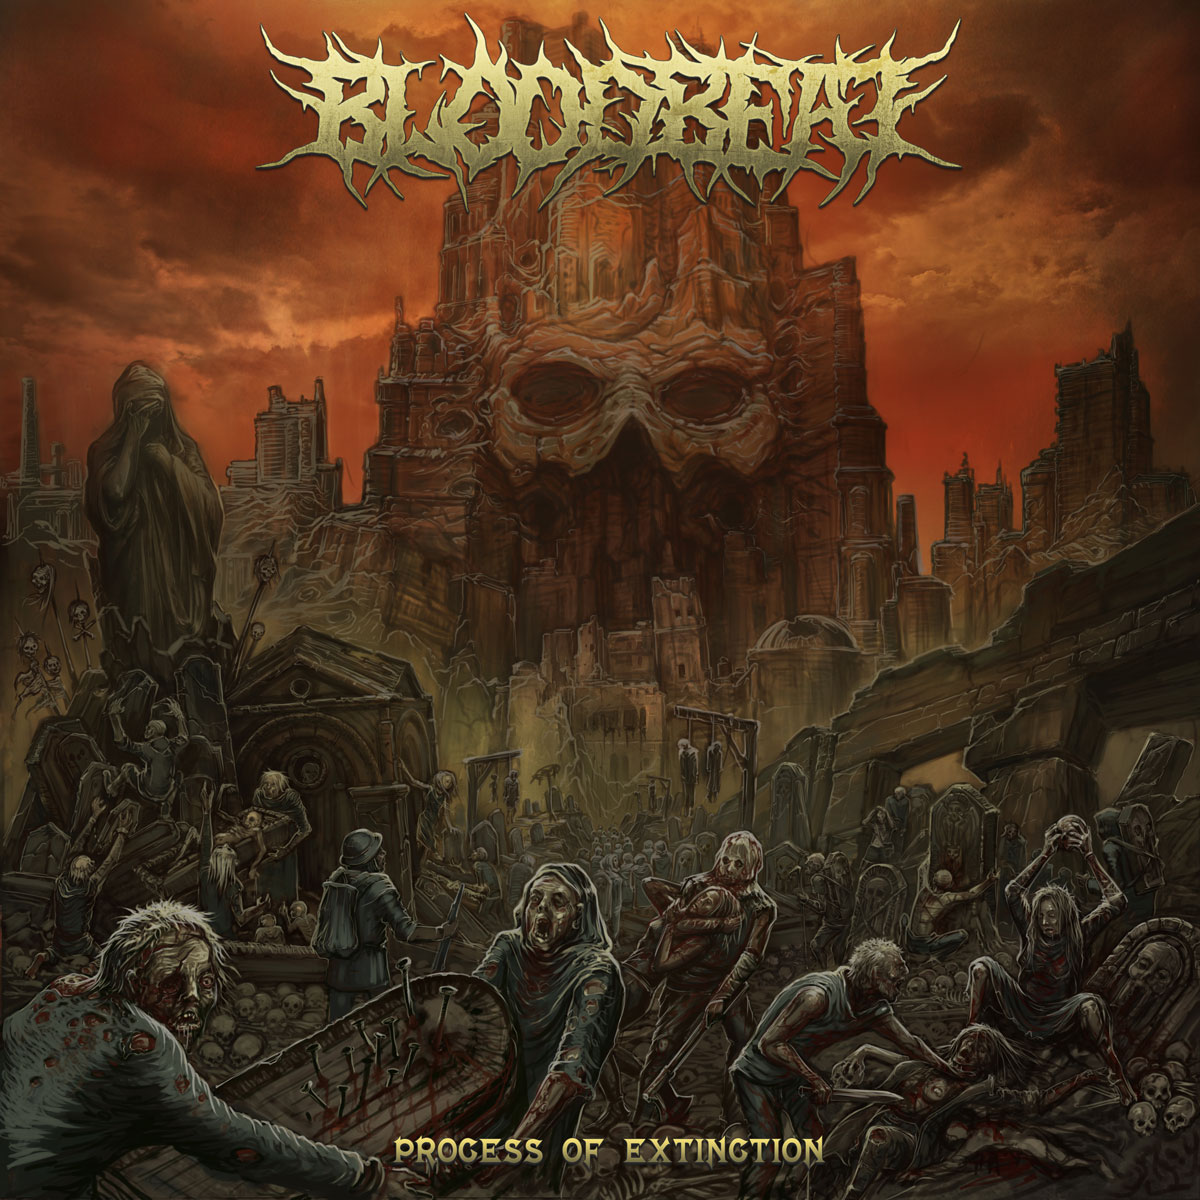 Bloodbeat Process of Extinction Album Cover Artwork